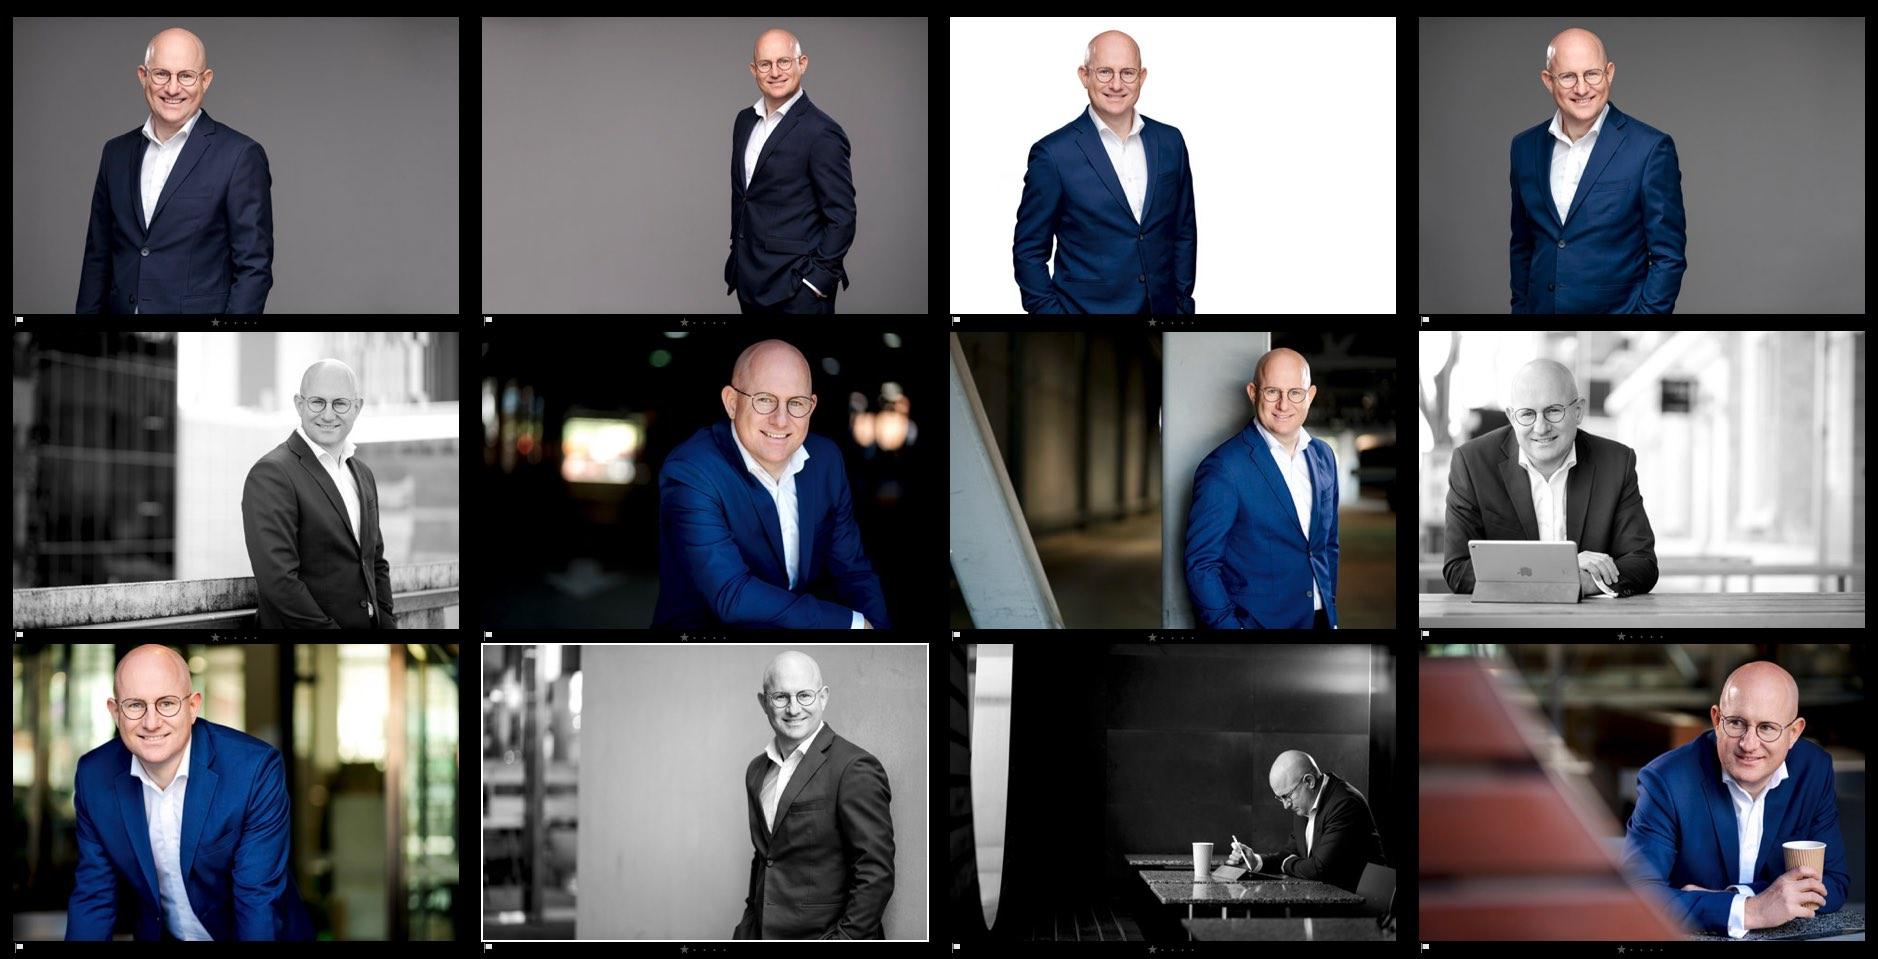 Darren-executive-branding-headshots.jpg